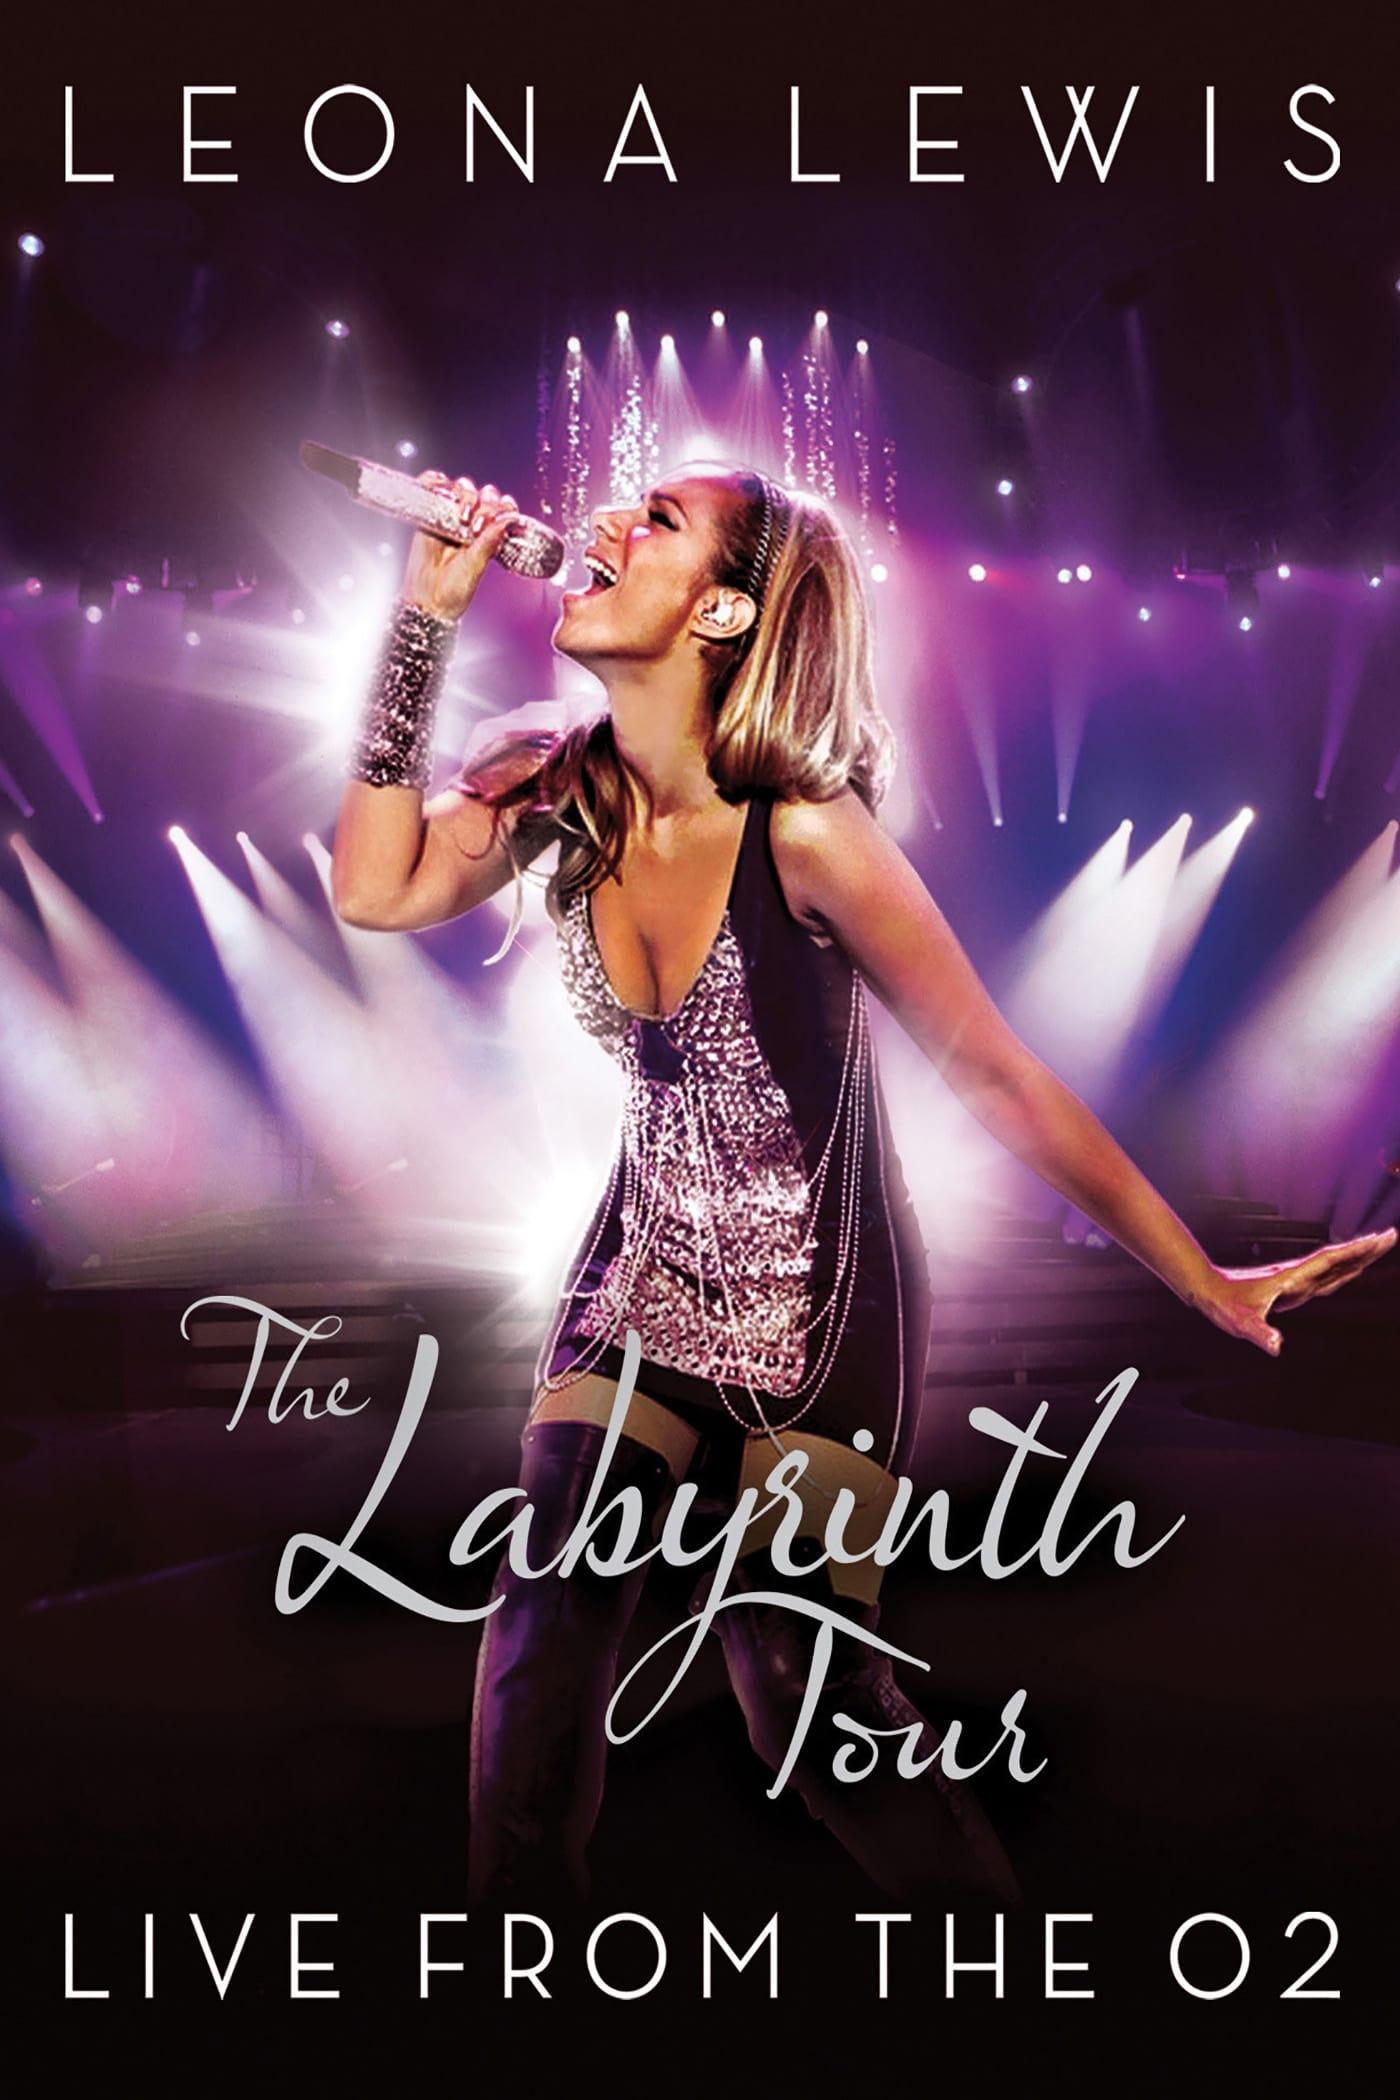 Leona Lewis: The Labyrinth Tour (2010)